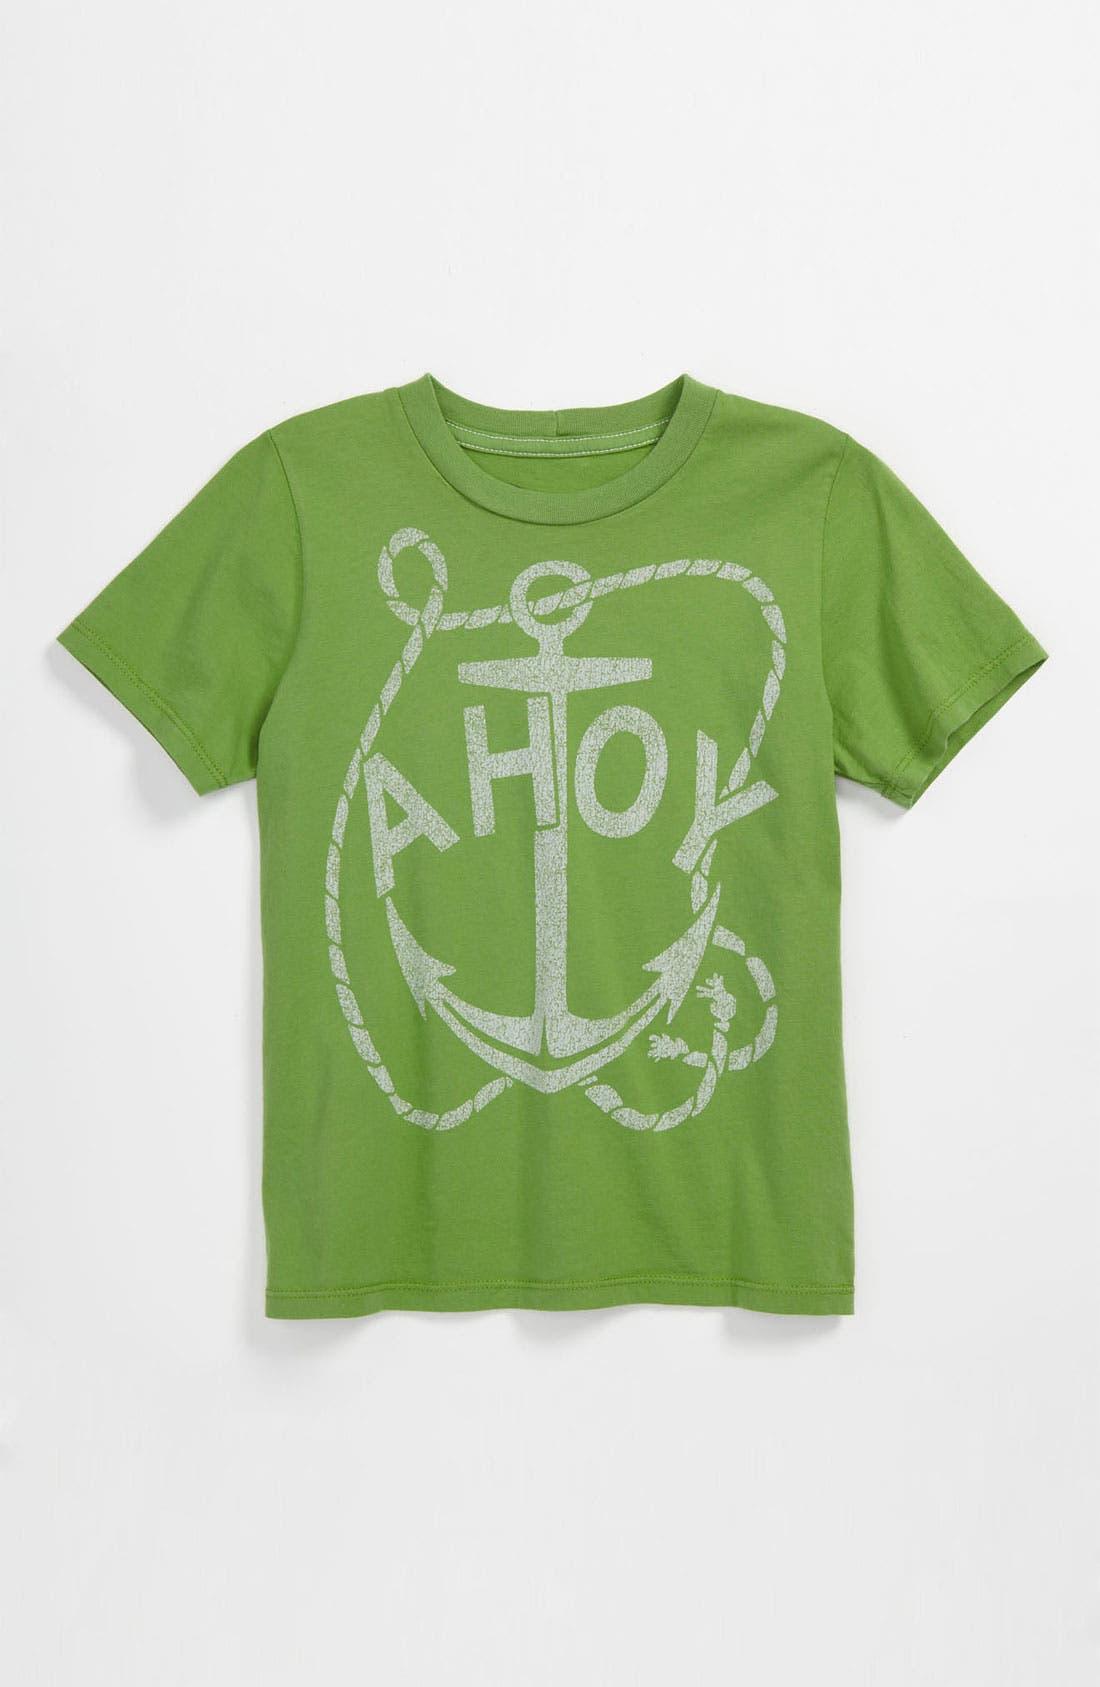 Alternate Image 1 Selected - Peek 'Ahoy' T-Shirt (Toddler, Little Boys & Big Boys)